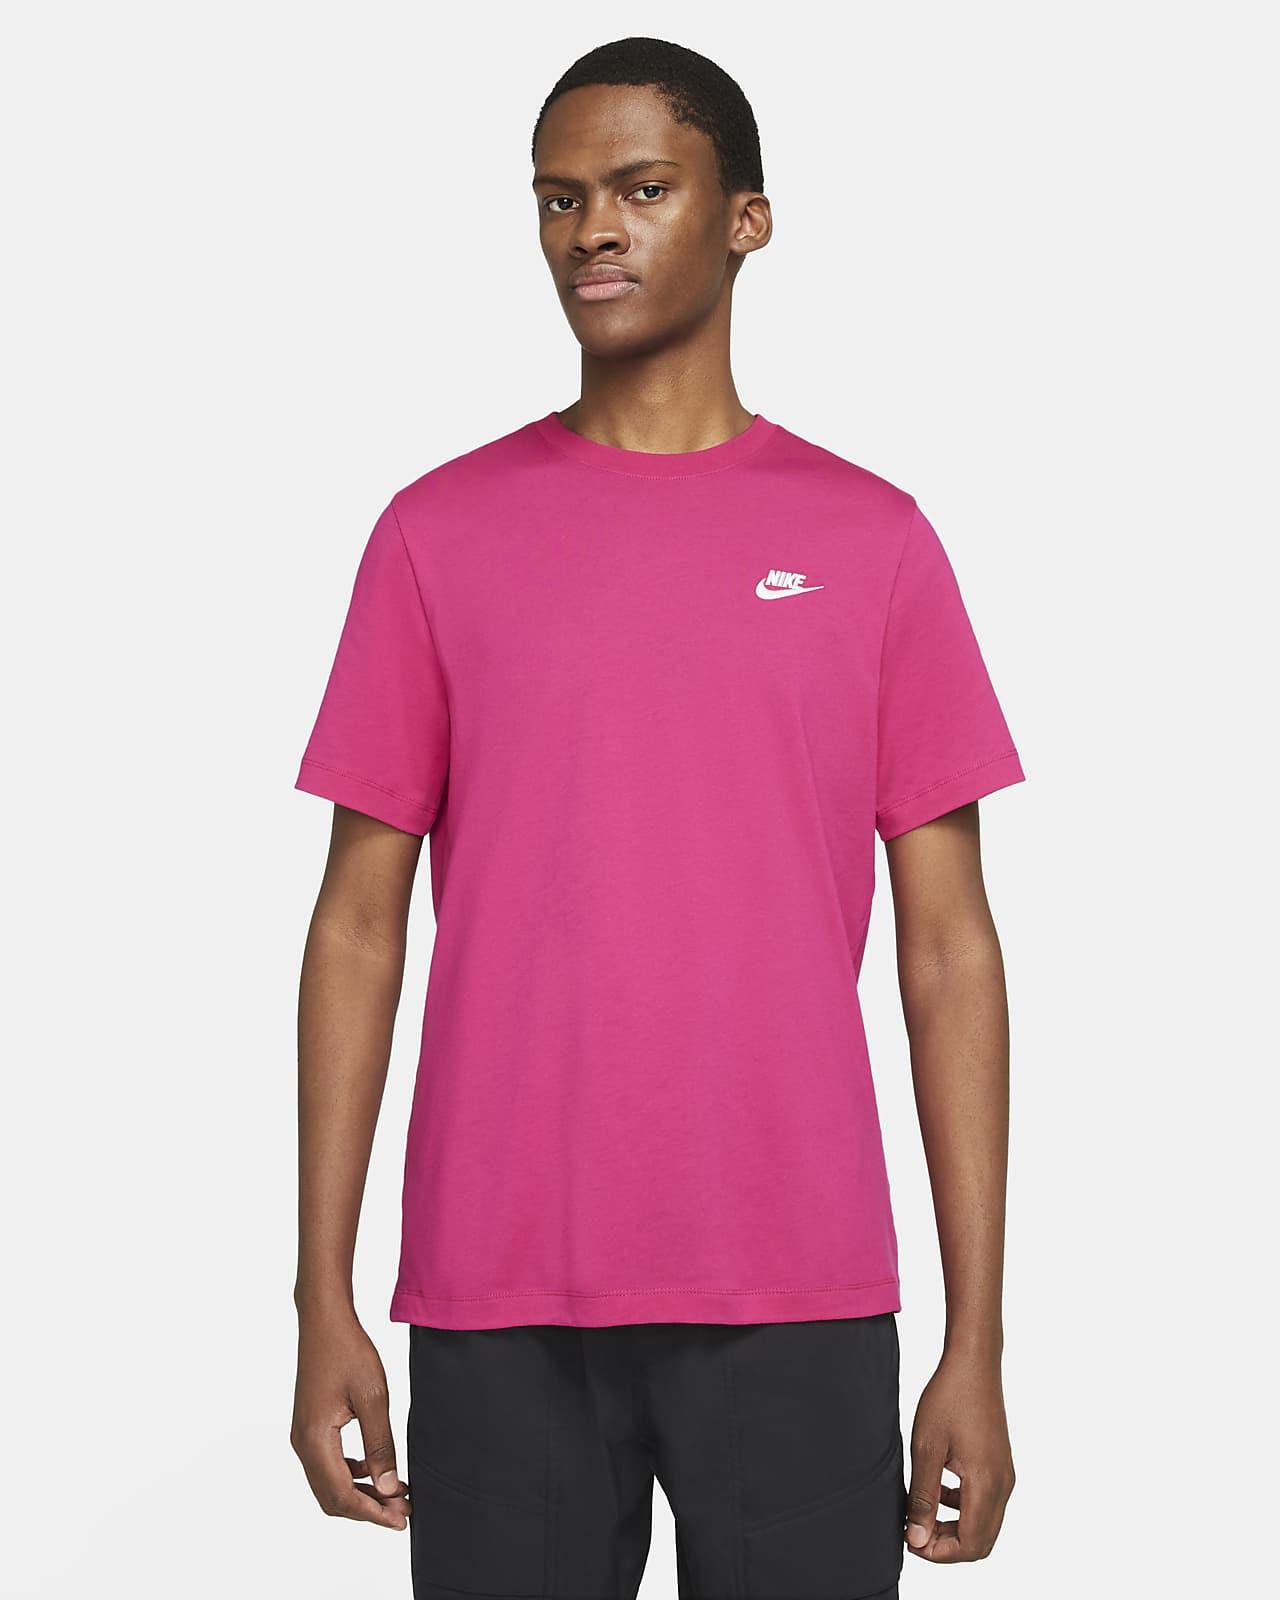 Conquistar papa Alcanzar  Nike Sportswear Club Men's T-Shirt. Nike.com